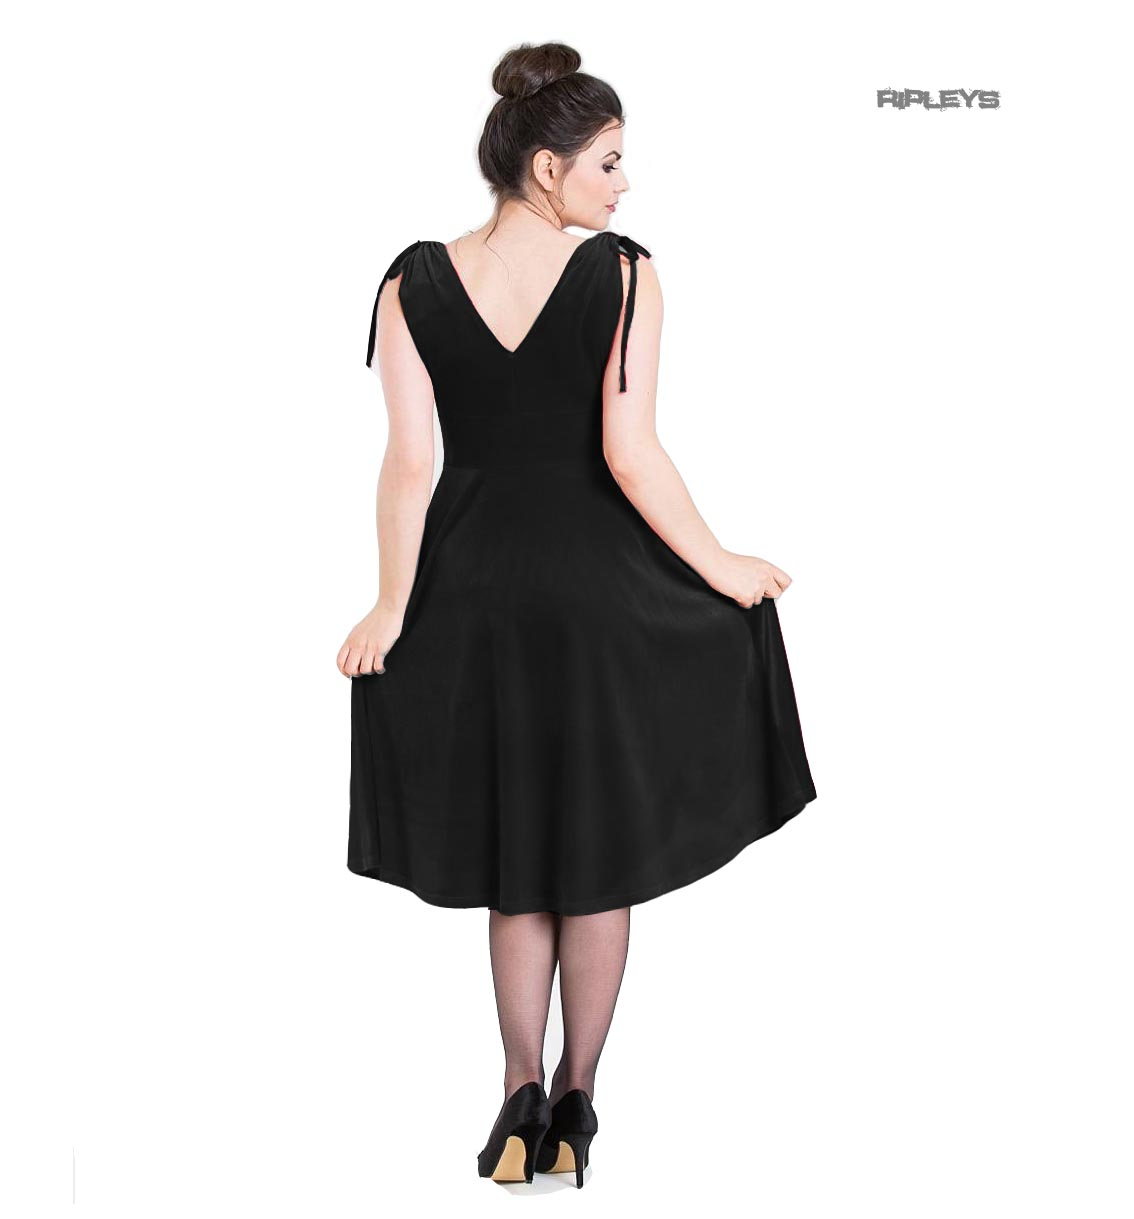 Hell-Bunny-40s-50s-Elegant-Pin-Up-Dress-MELINA-Crushed-Velvet-Black-All-Sizes thumbnail 12